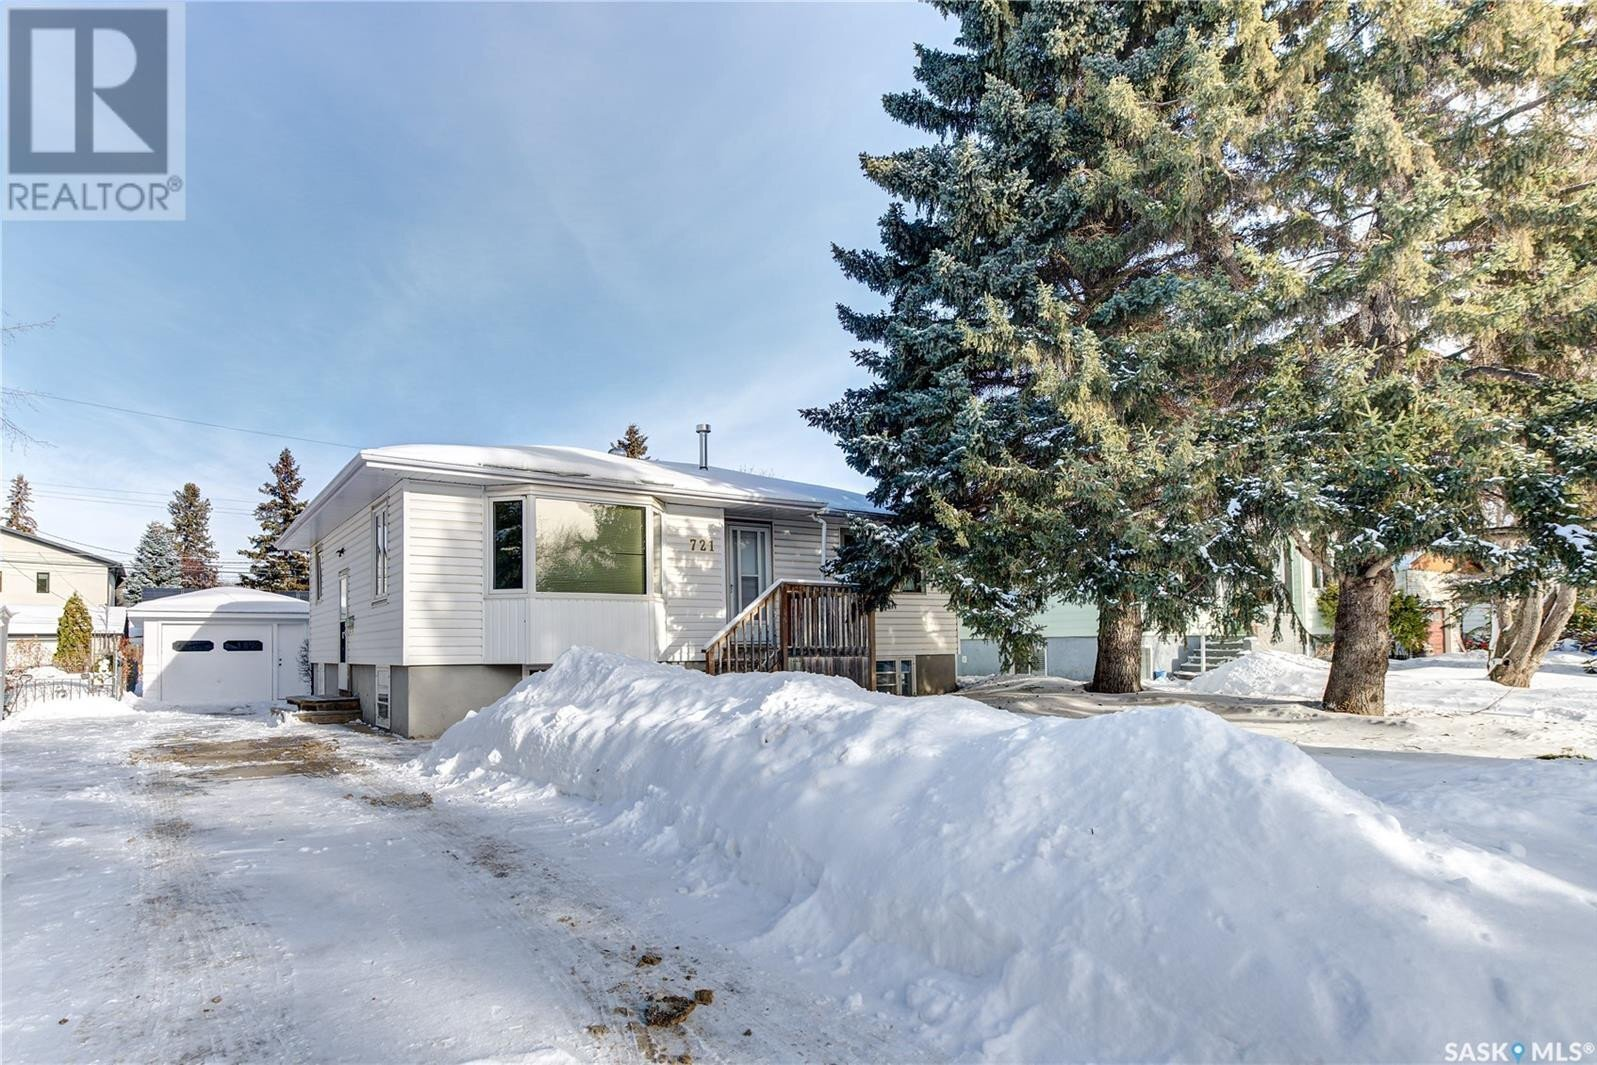 House for sale at 721 2nd St E Saskatoon Saskatchewan - MLS: SK839564